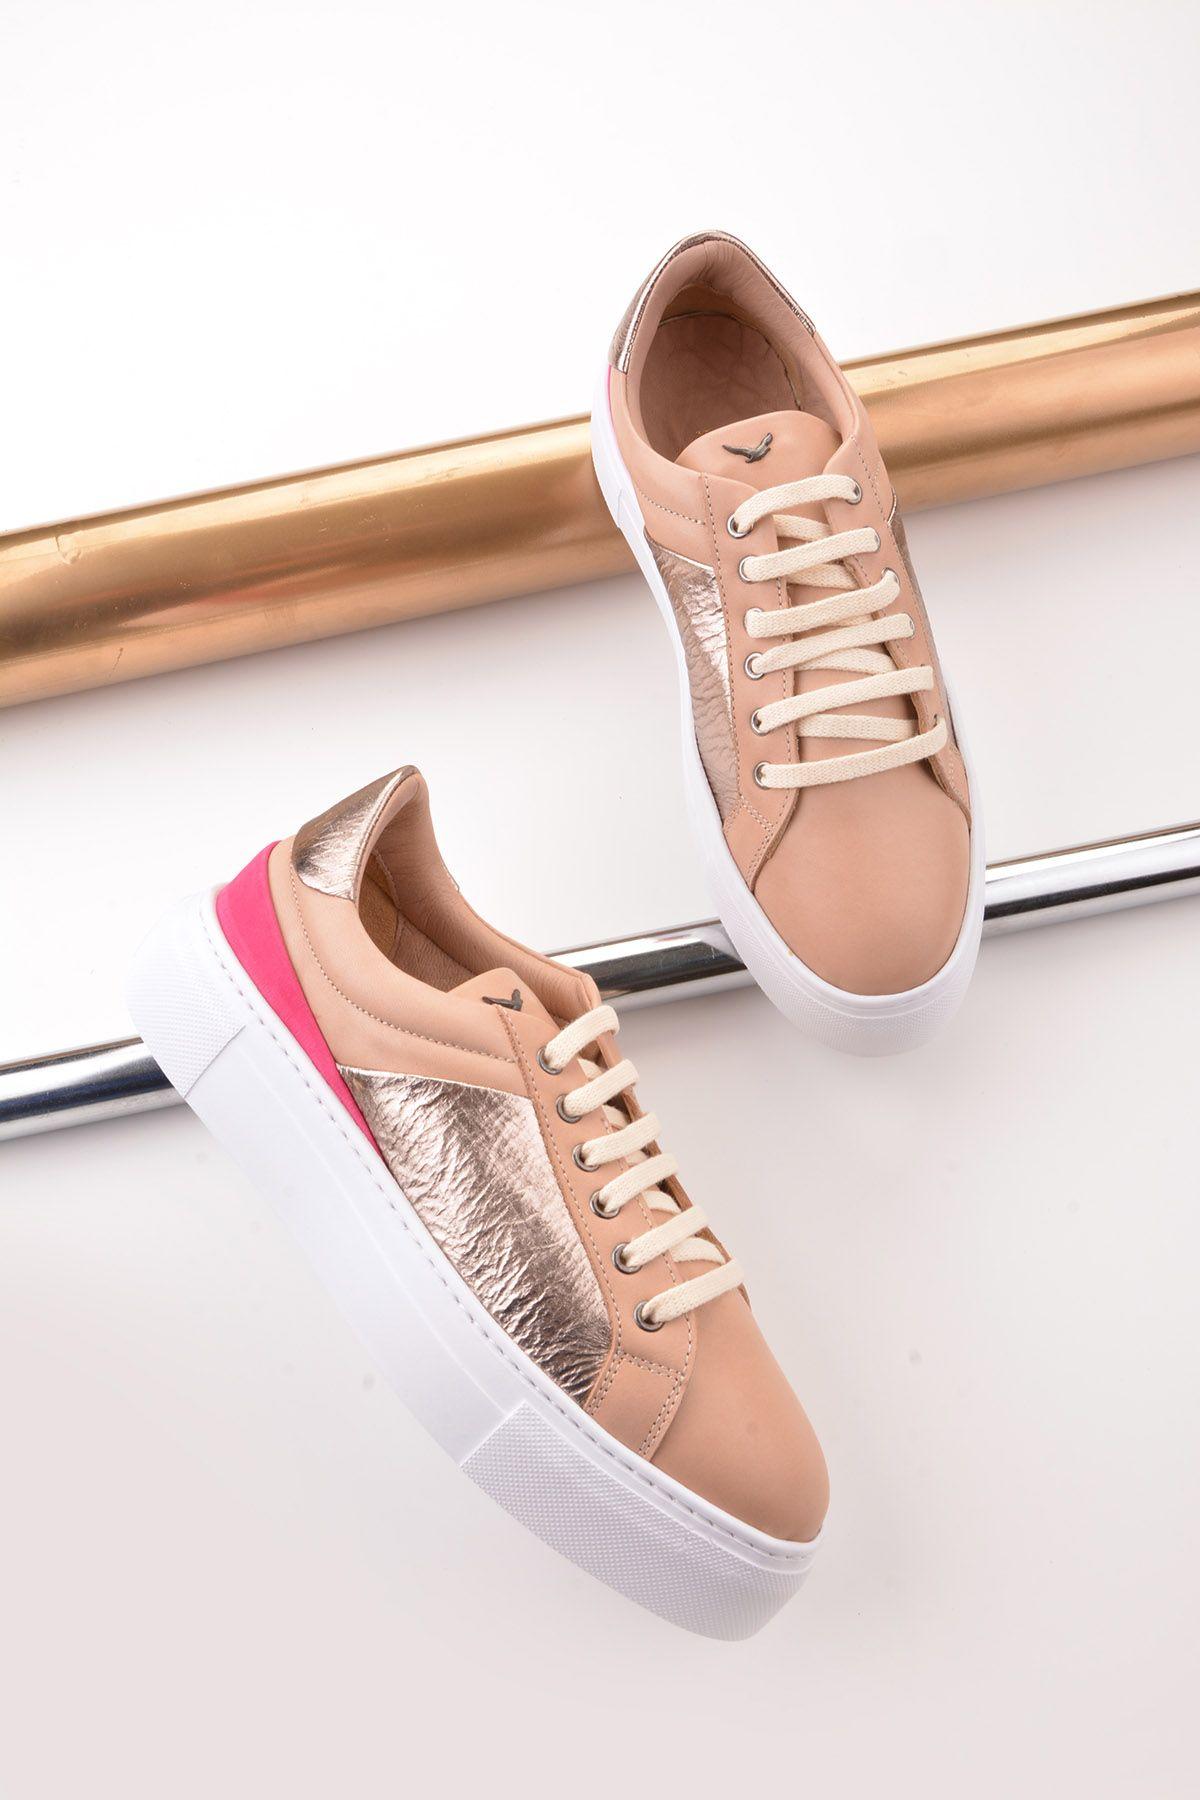 Pegia Blanche Hakiki Deri Bayan Spor Ayakkabı REC-002 Krem